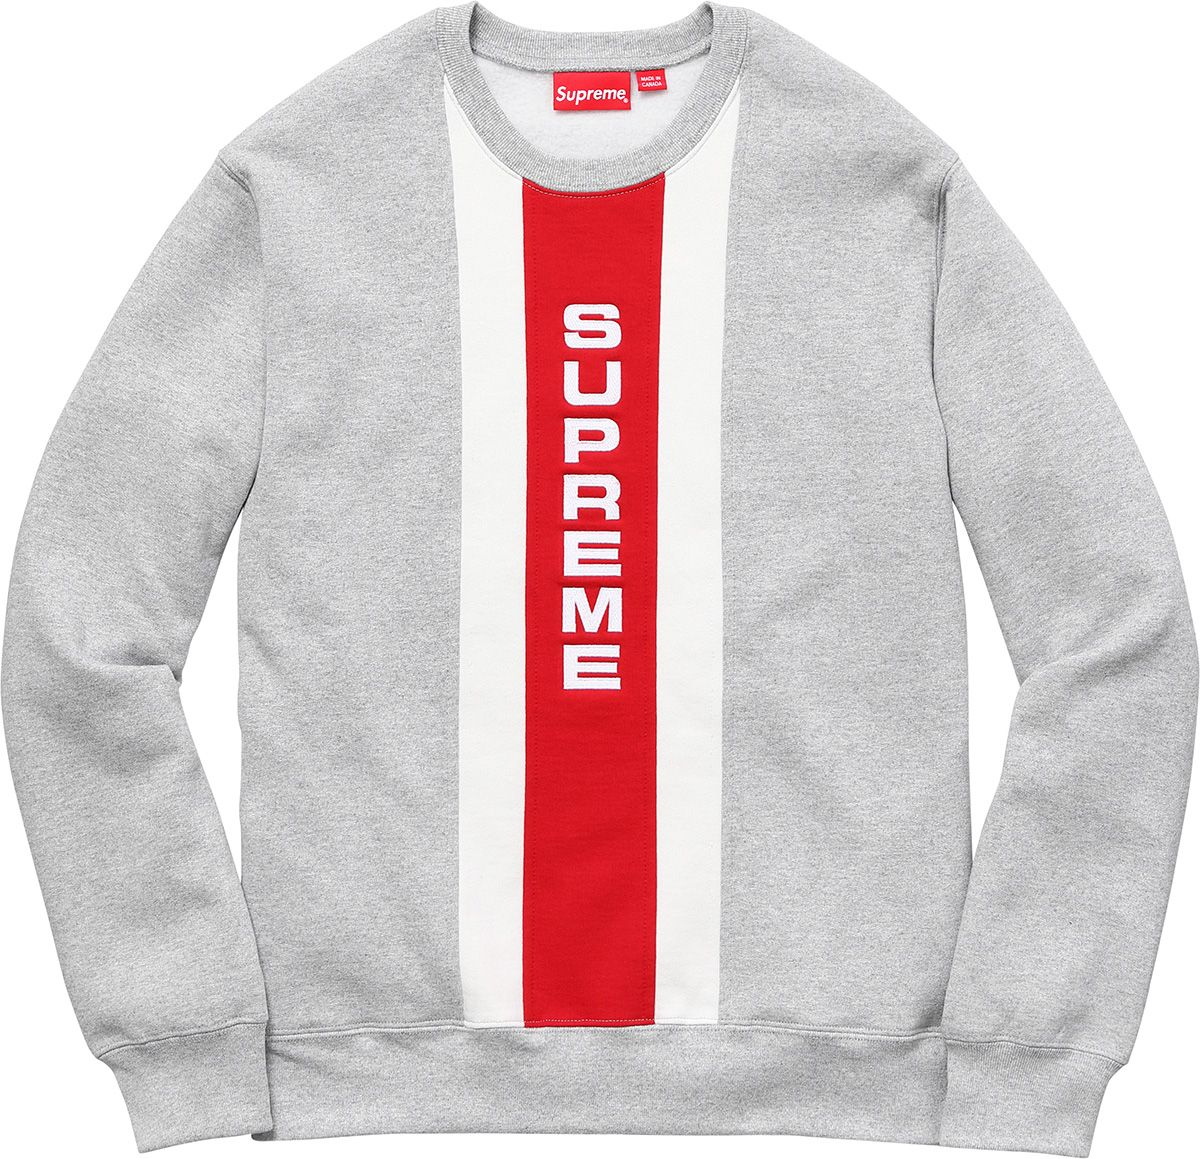 Supreme Vertical Logo Panel Crewneck Supreme Clothing Polo Design Hoodie Fashion [ 1159 x 1200 Pixel ]